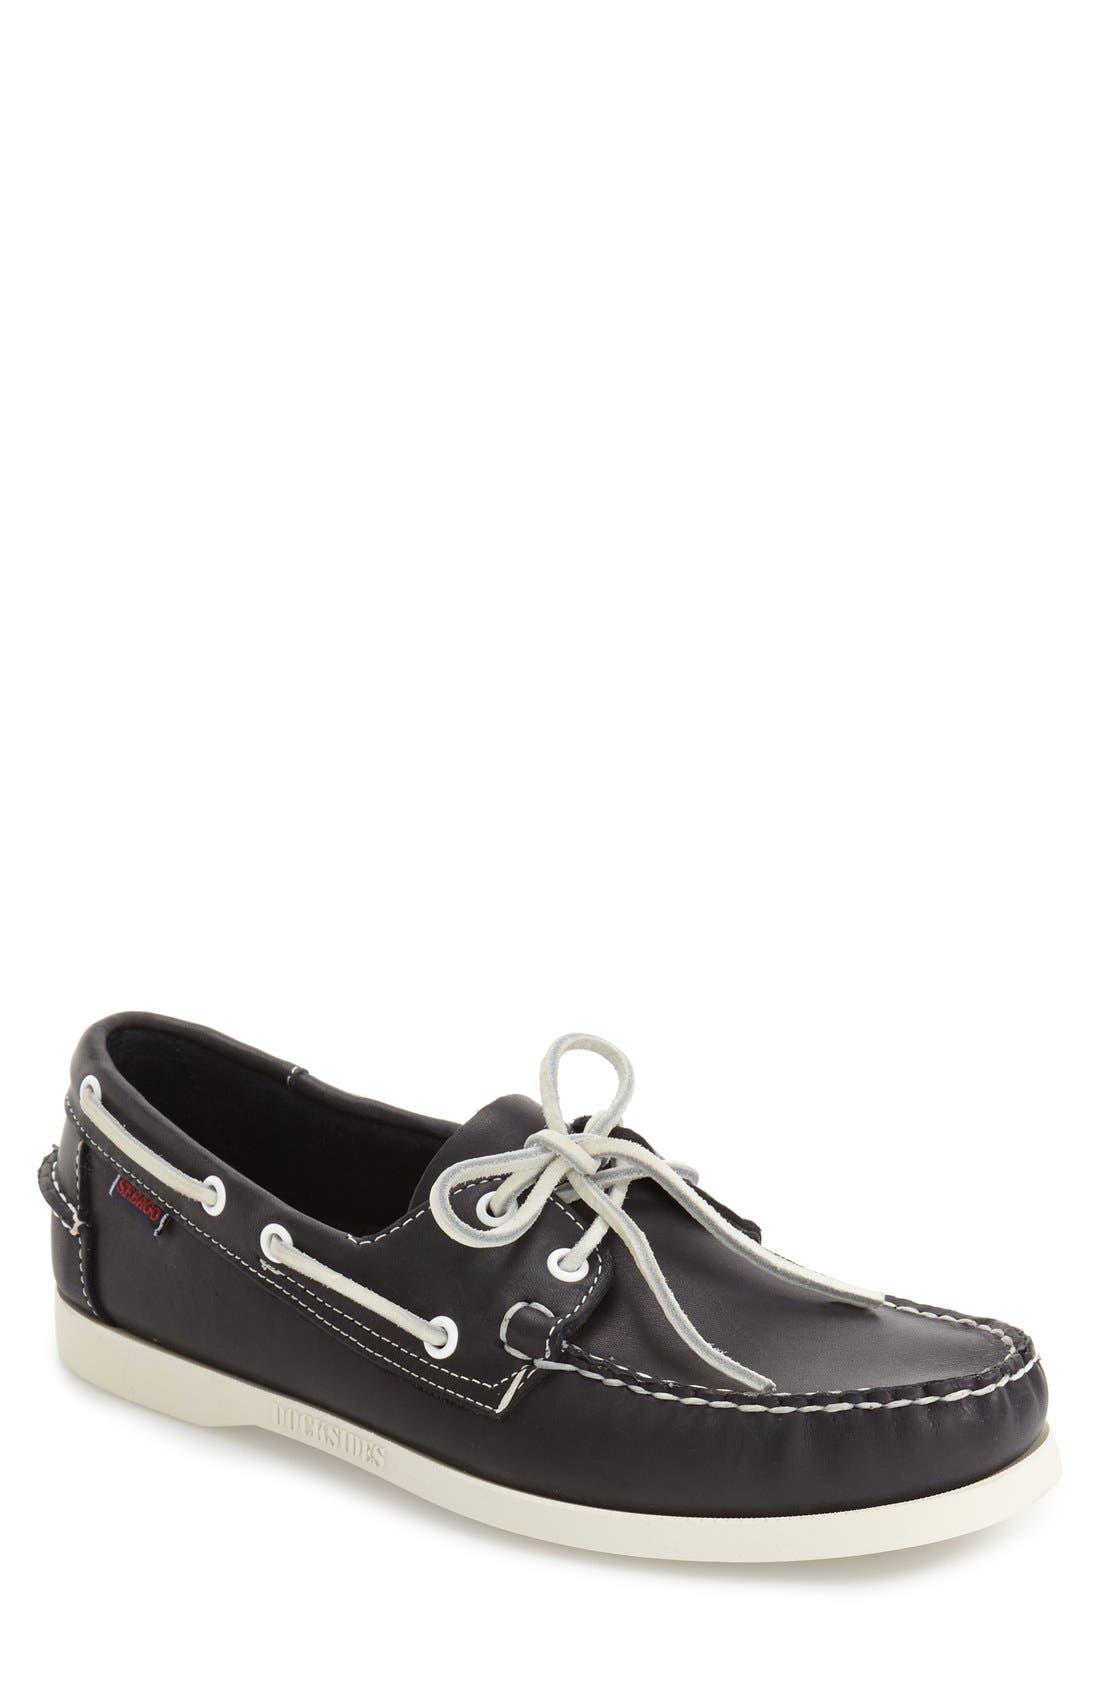 Sebago 'Docksides®' Boat Shoe